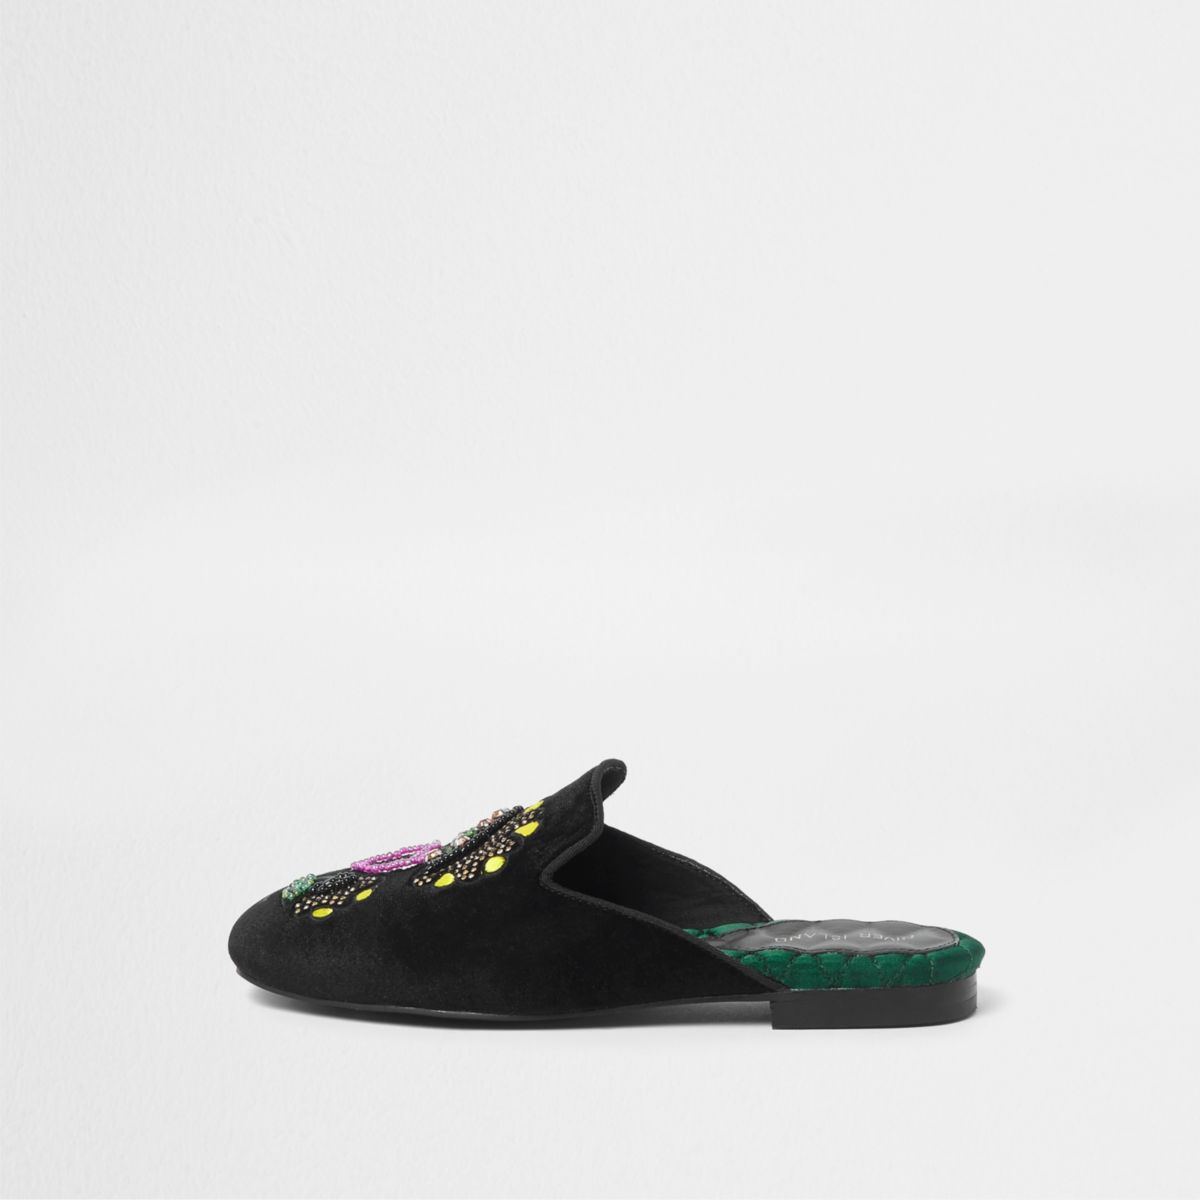 Black velvet embroidered backless loafers